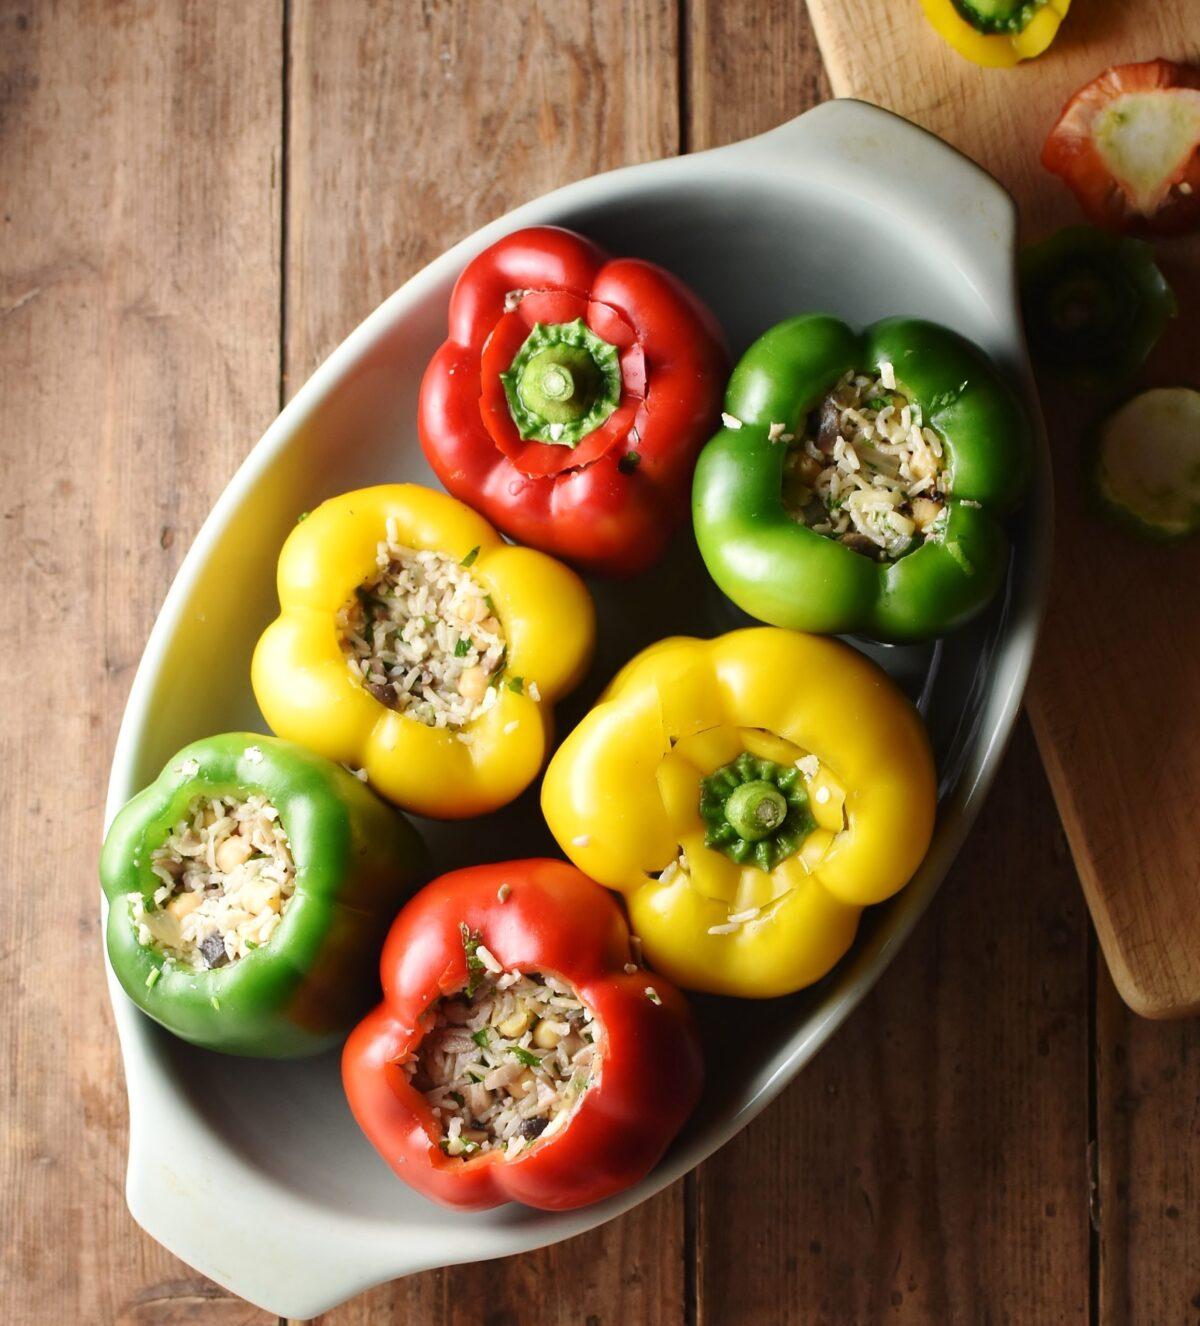 6 tri-coloured stuffed peppers in casserole dish.